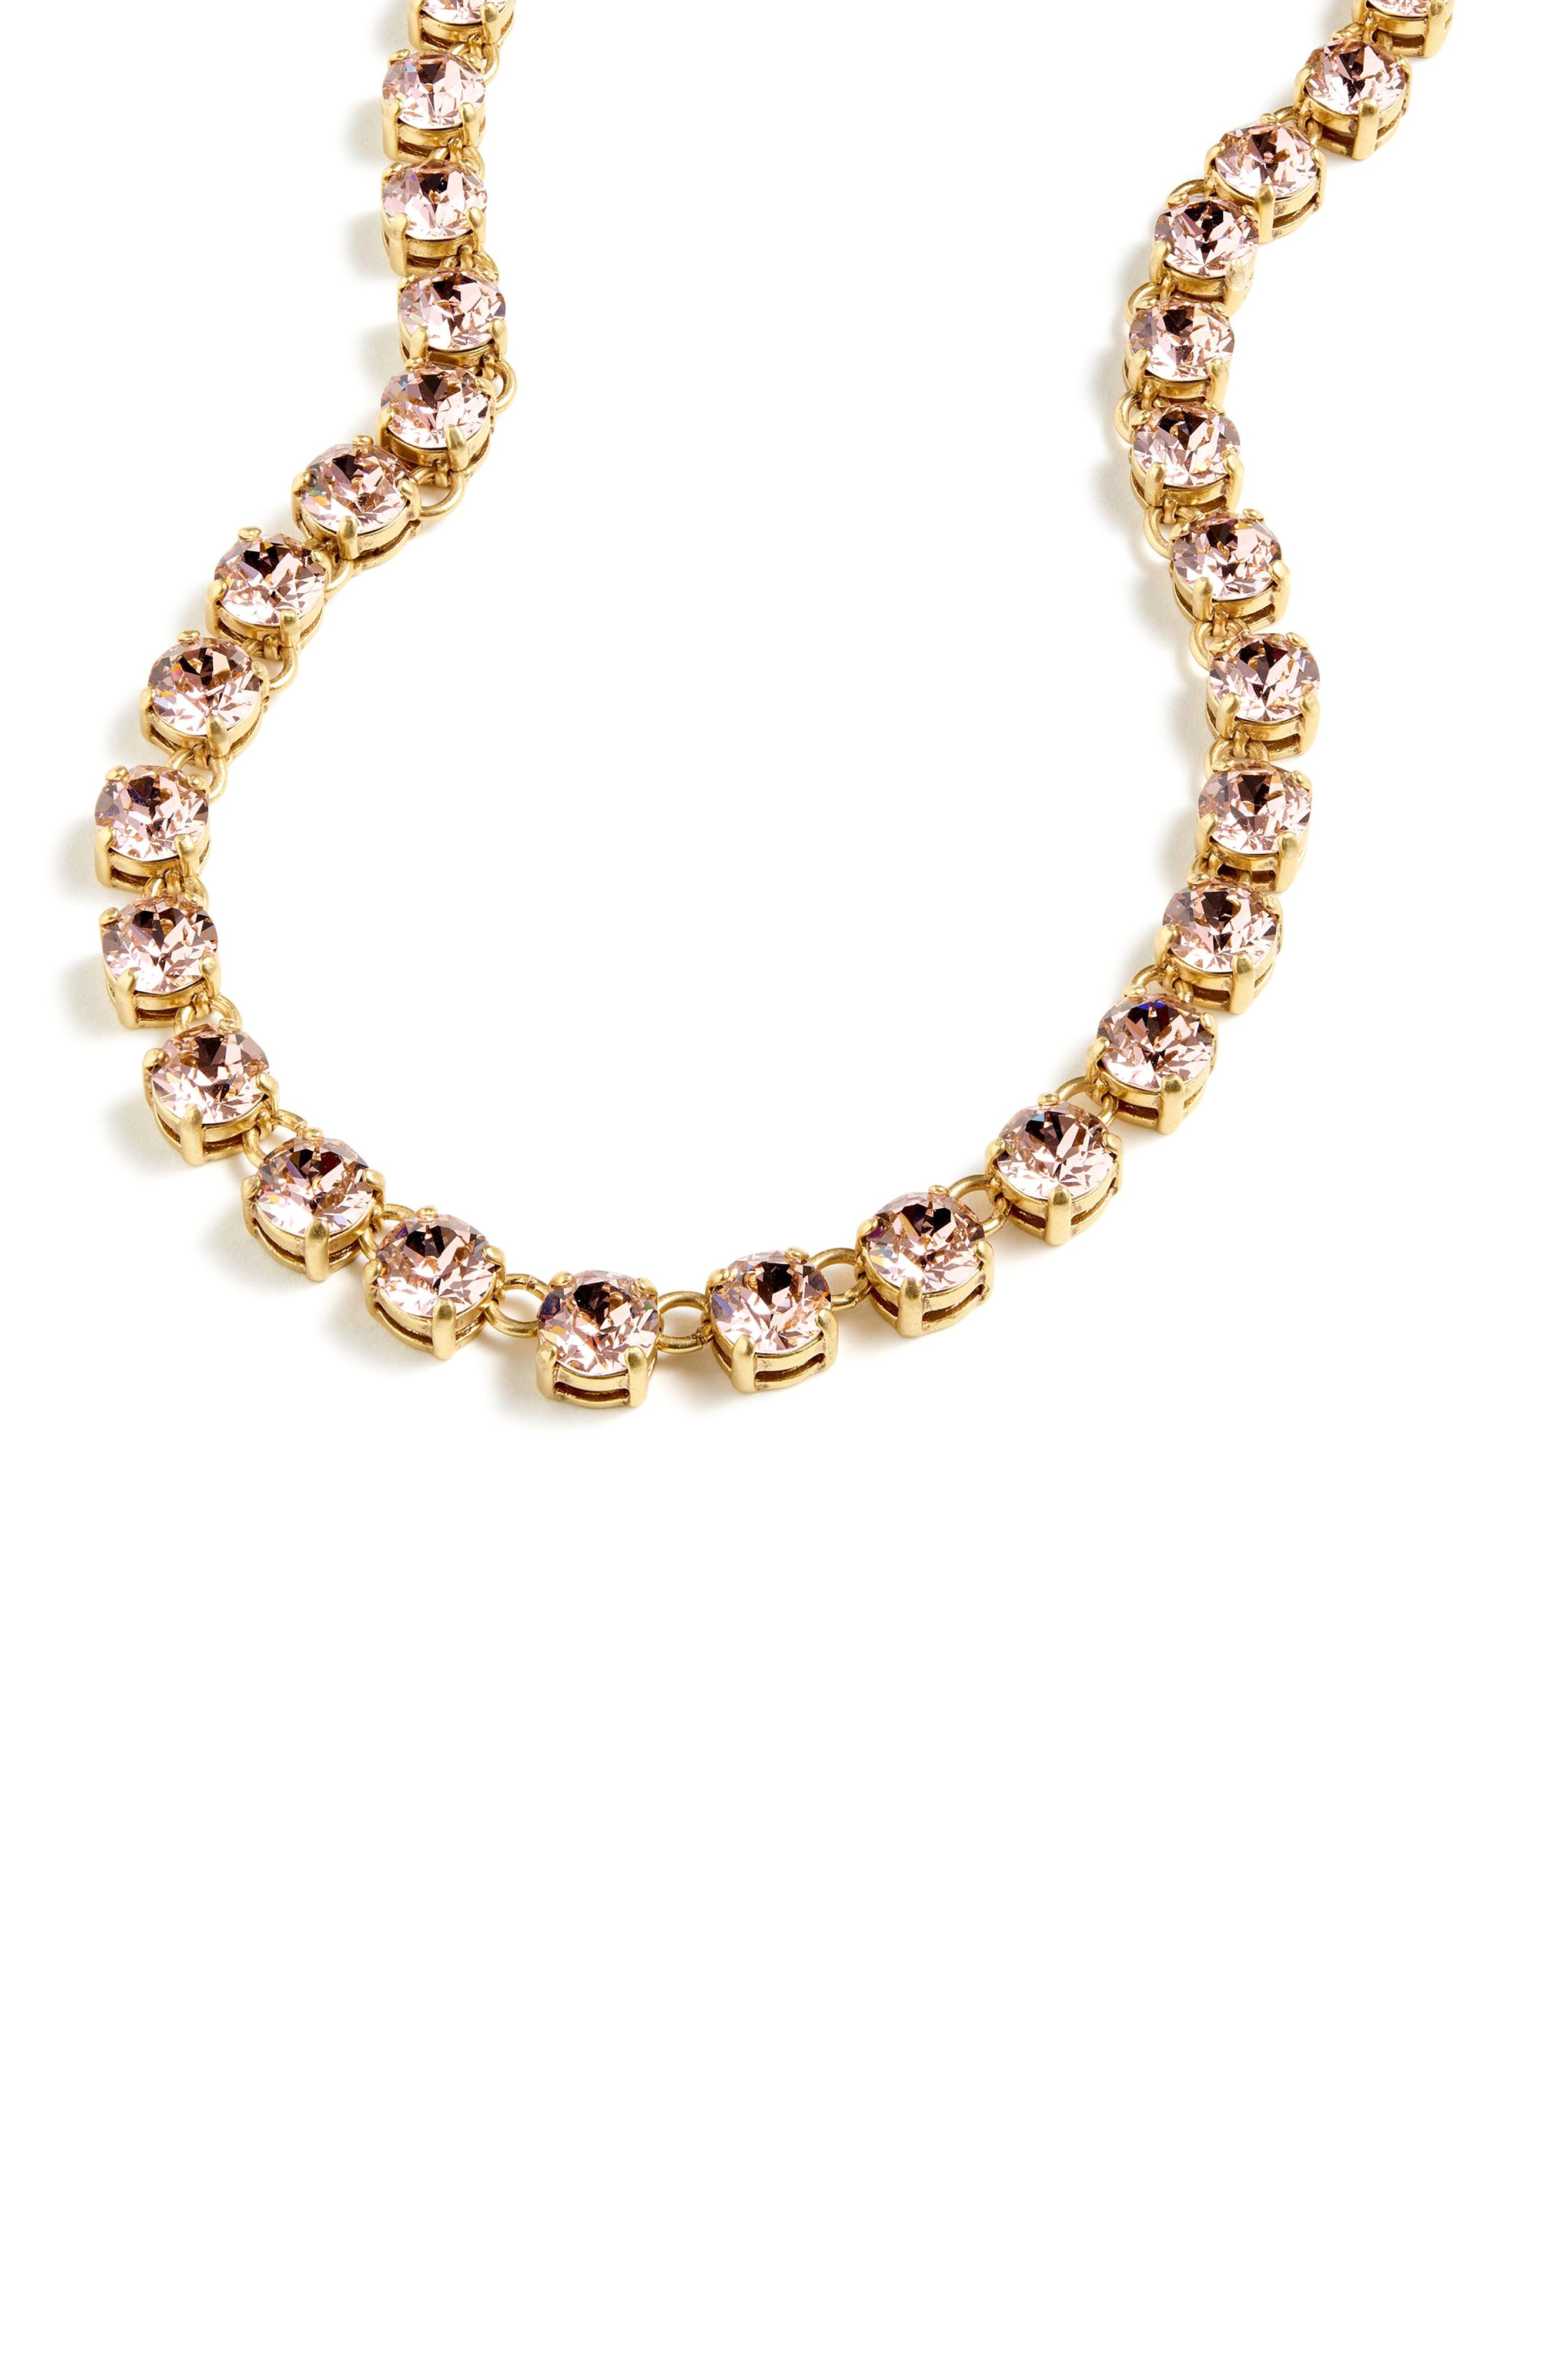 J.CREW Swarovski Crystal Dot Necklace in Jasmine Frost